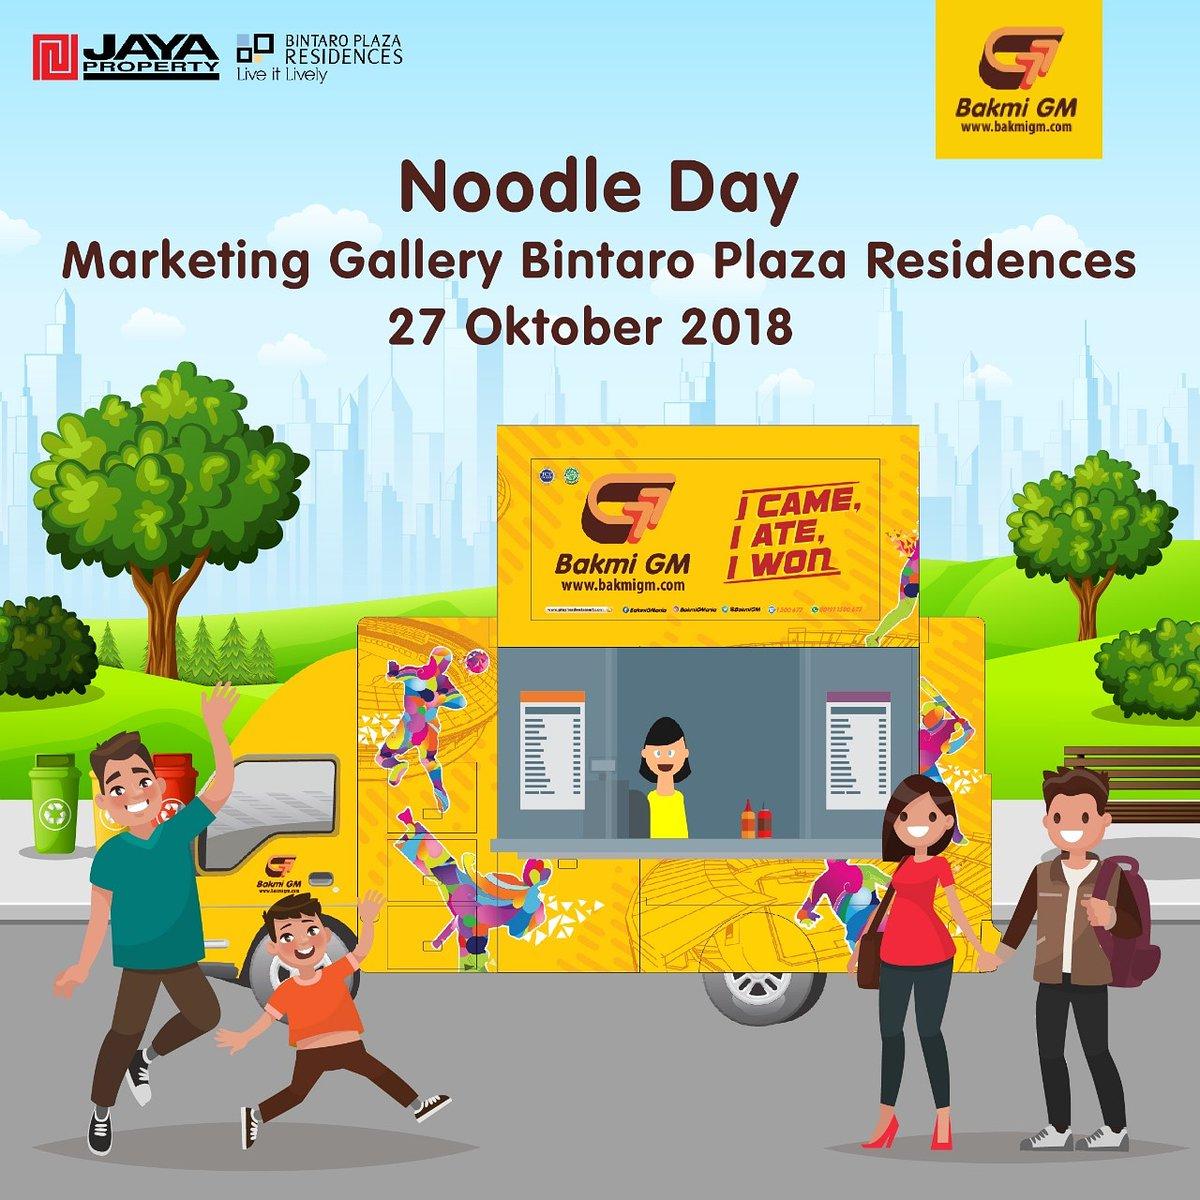 BakmiGM - Promo Event Noodle Day di Bintaro Plaza Residences (27 Otk 2018)